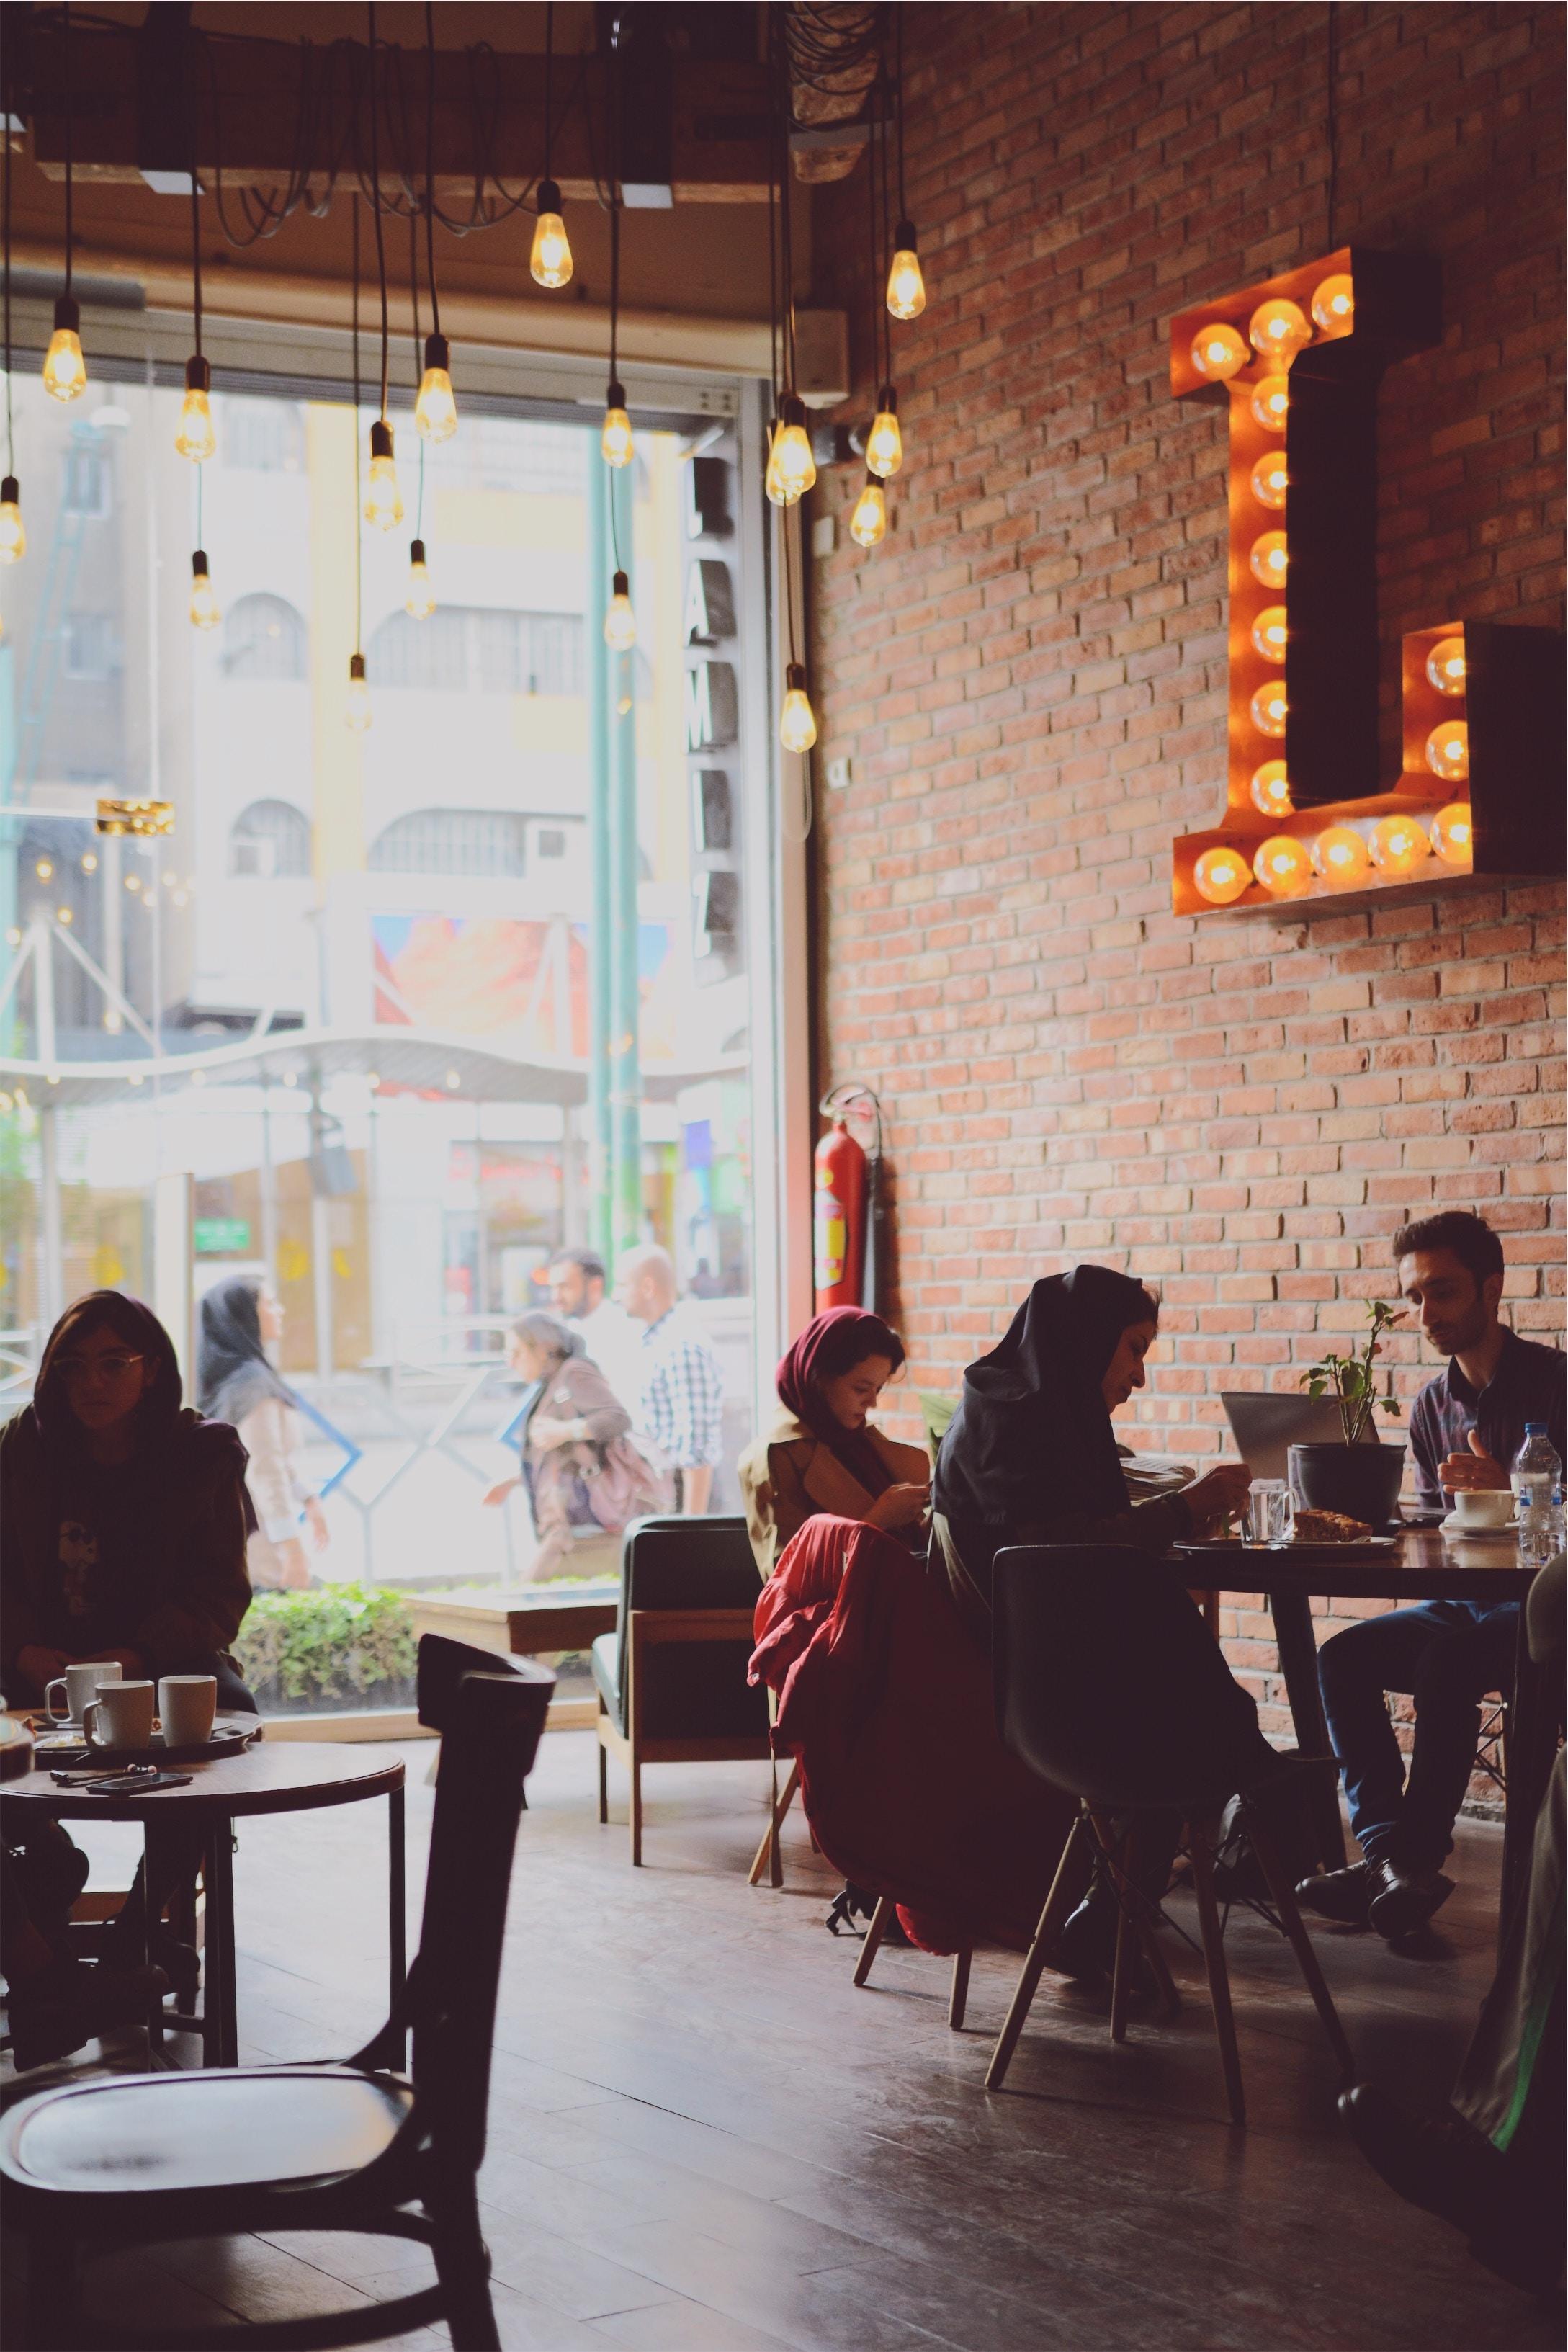 people sitting in coffee shop